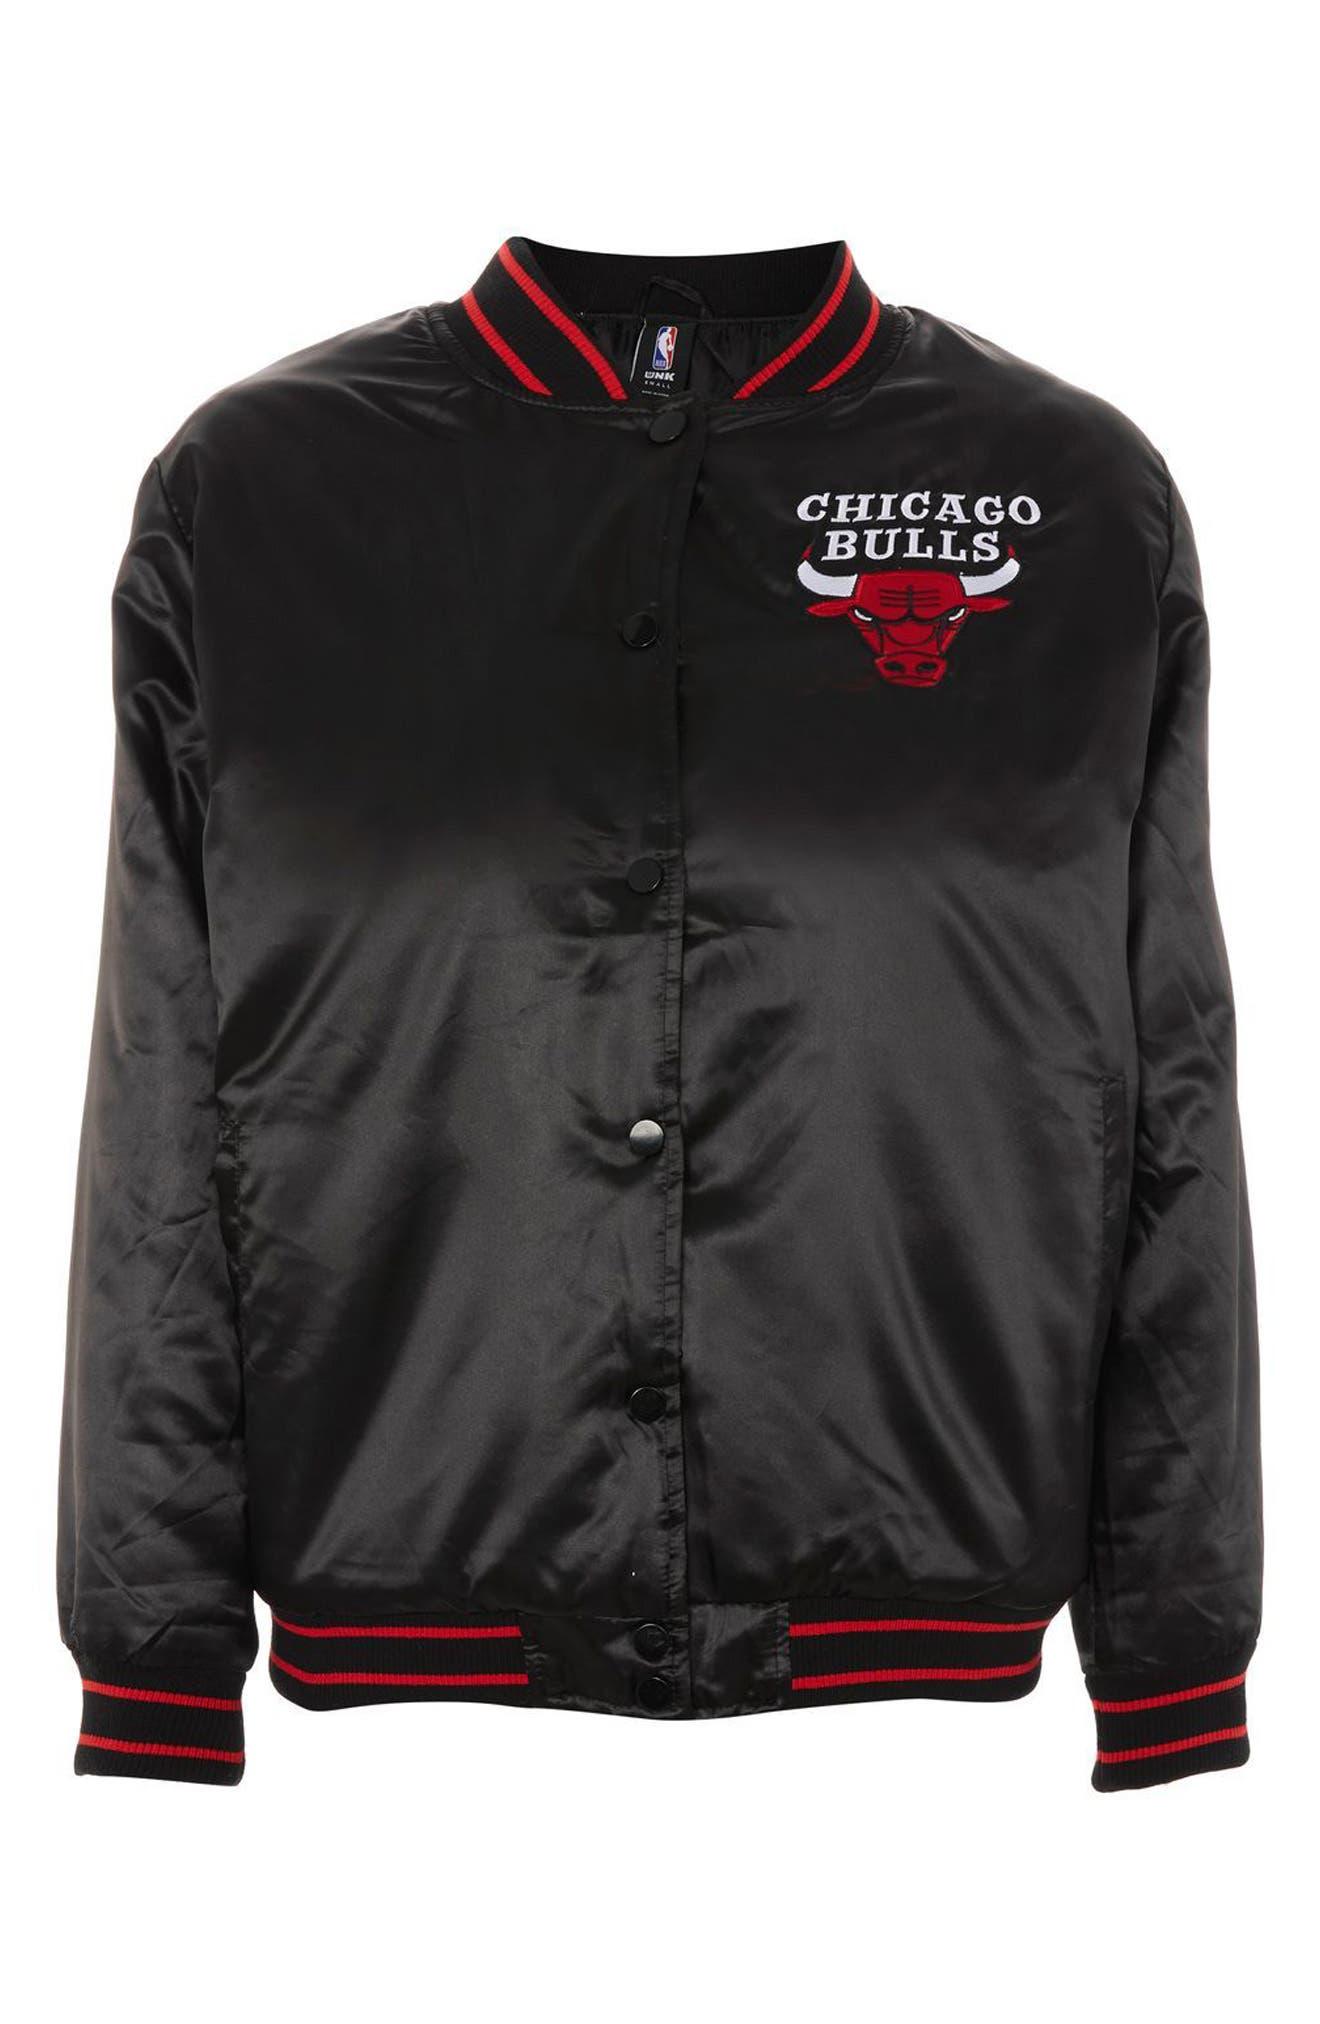 Main Image - Topshop x UNK Chicago Bulls Bomber Jacket